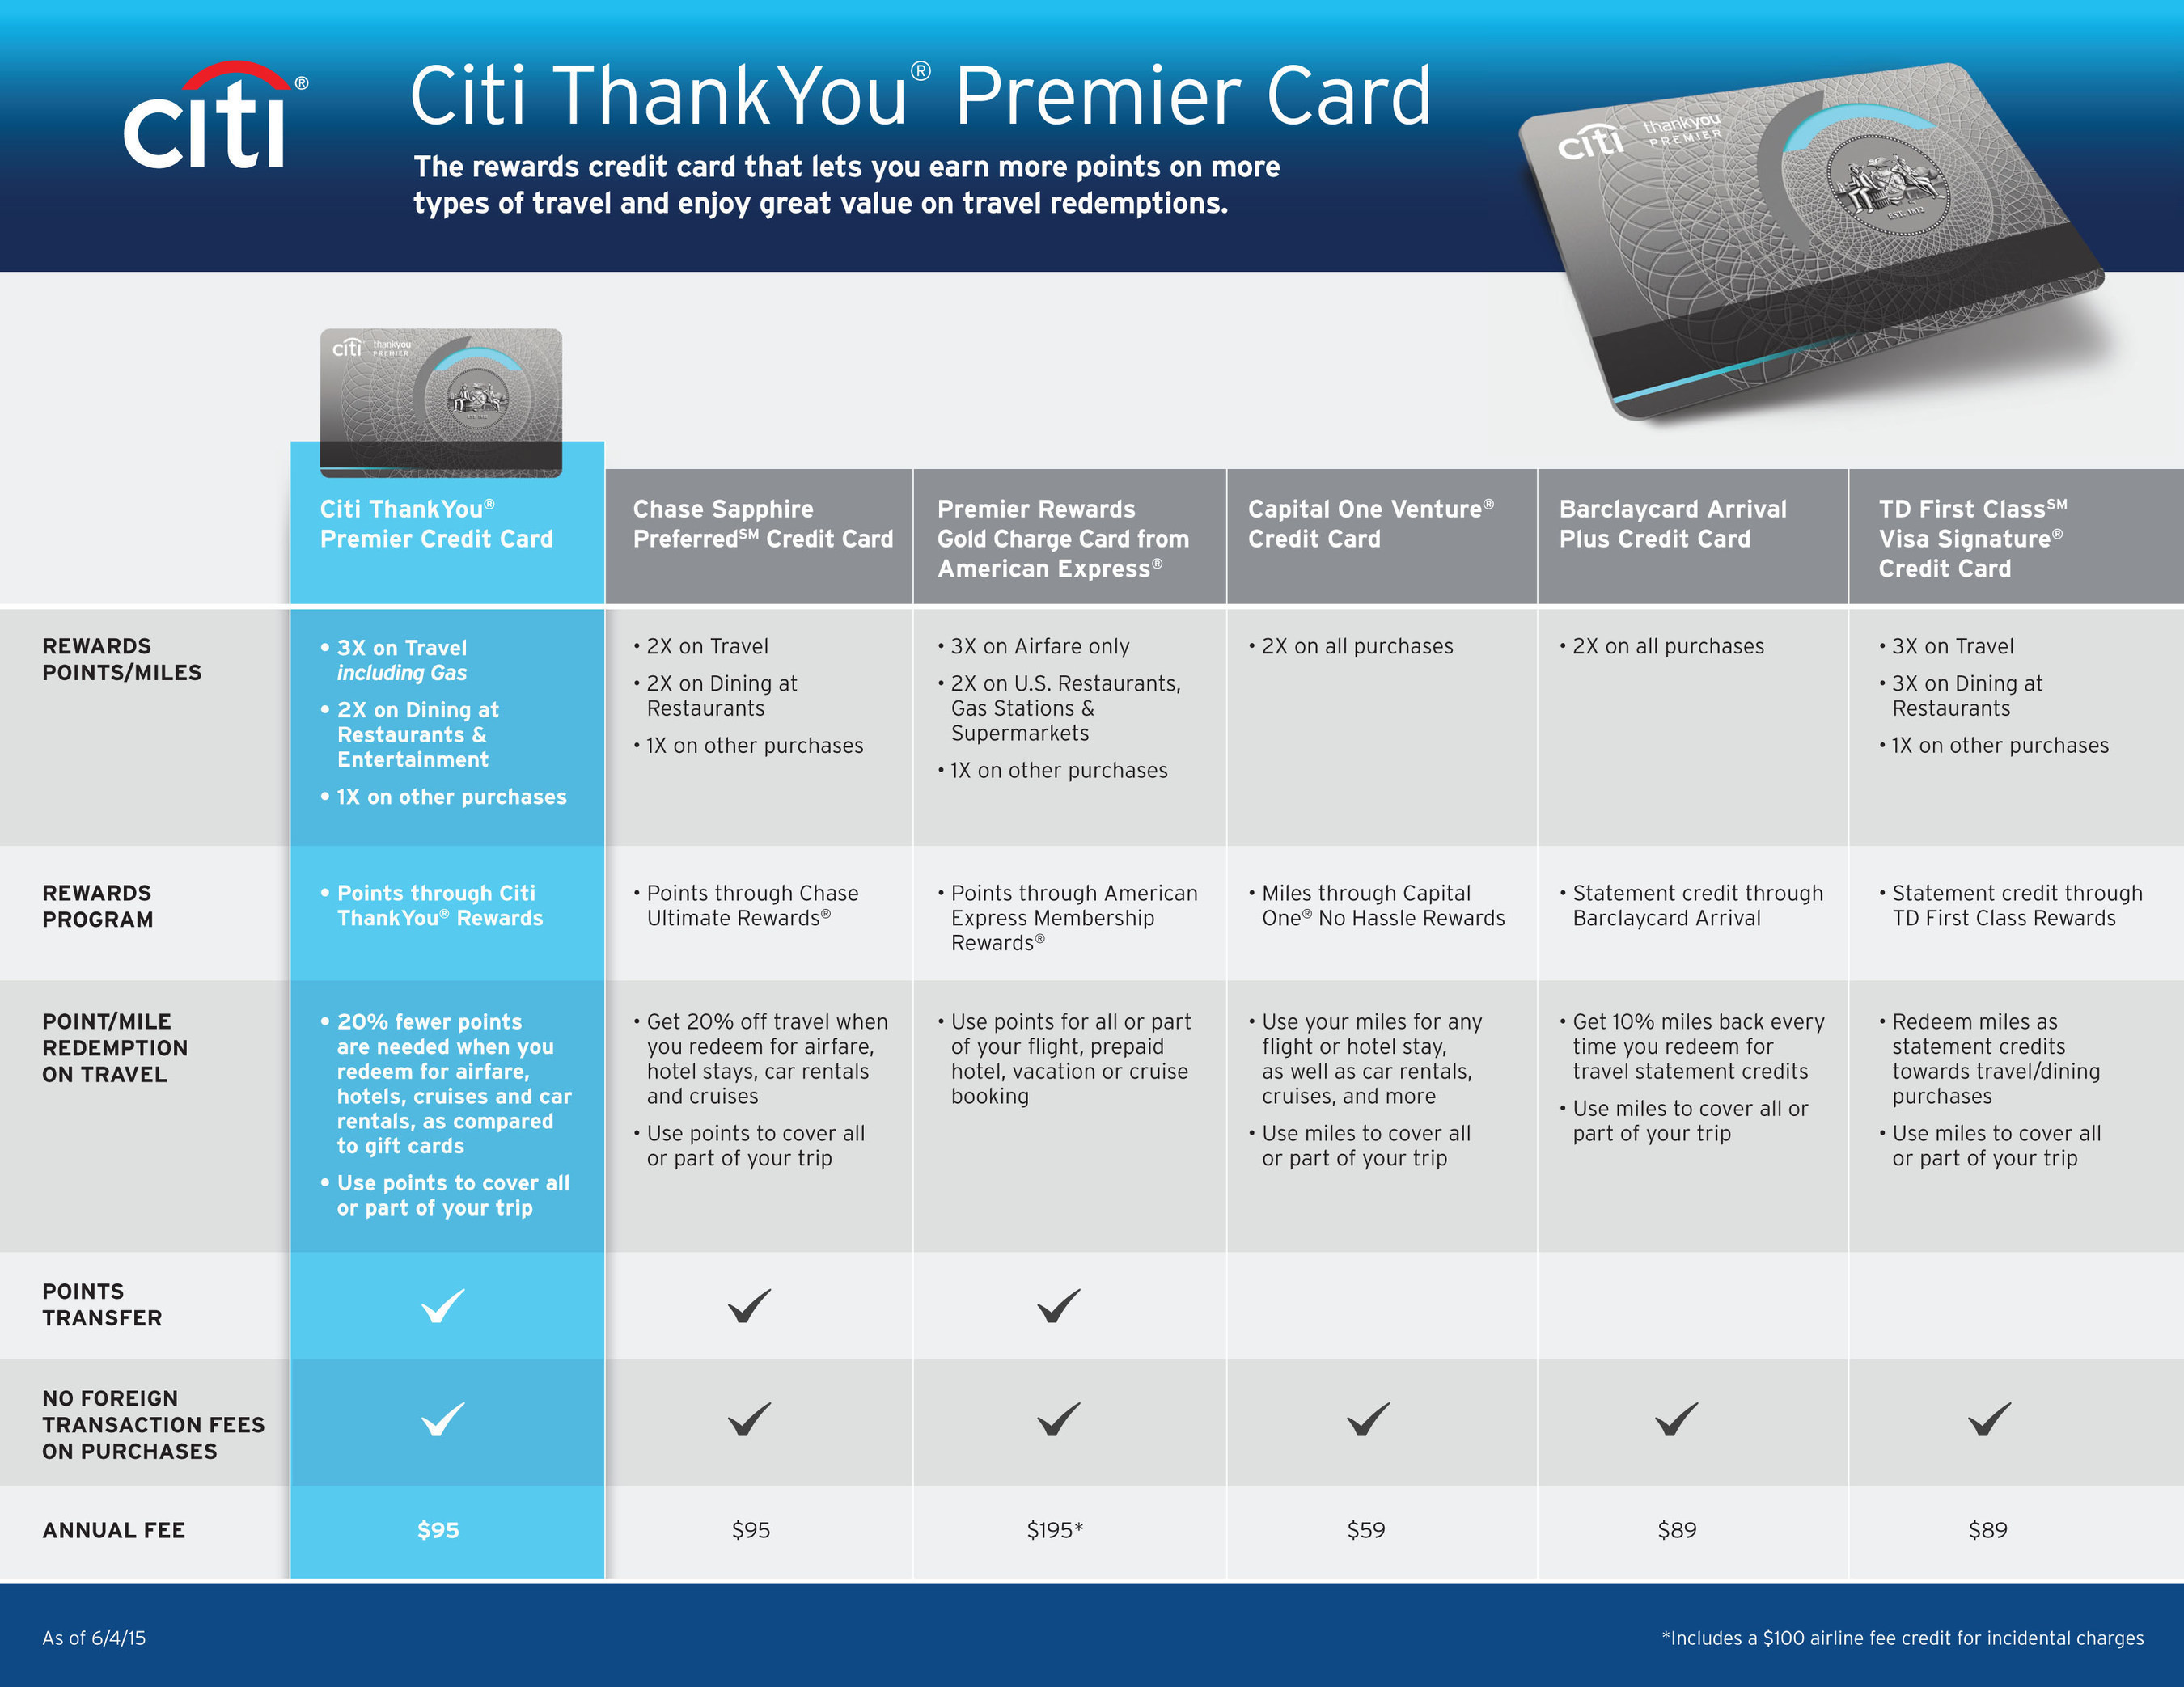 Citi ThankYou Premier Card comparison chart